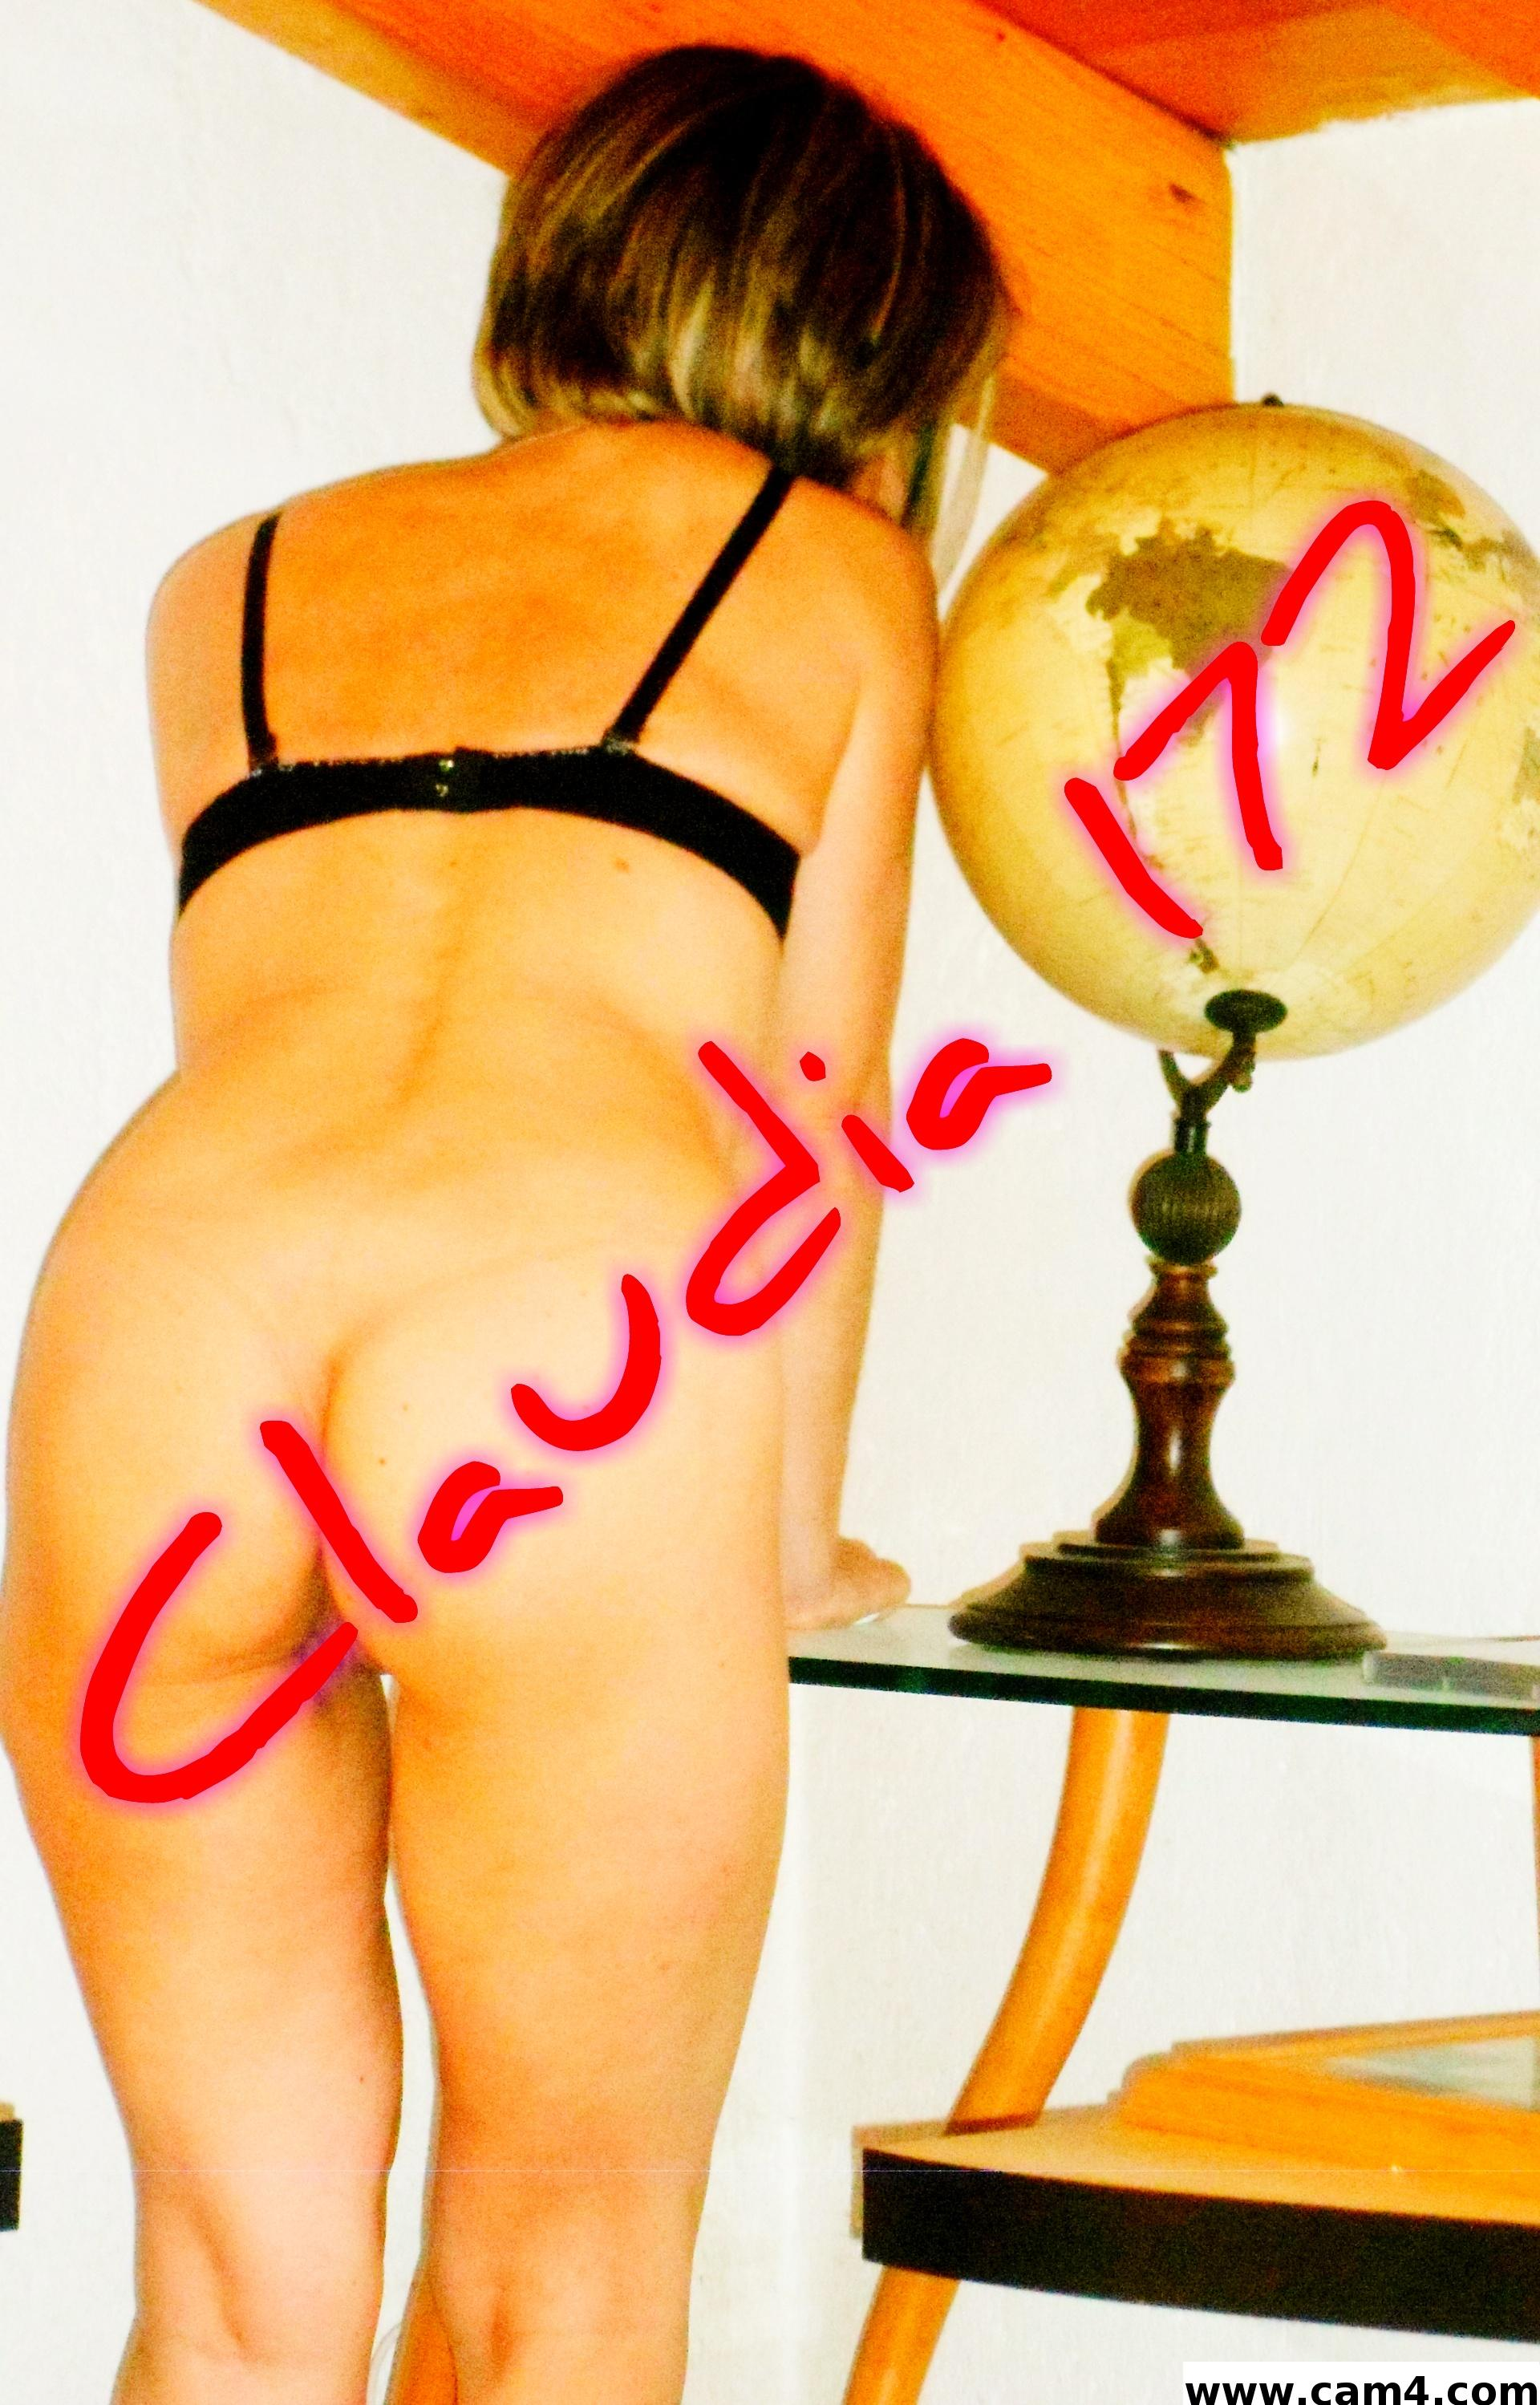 Claudia172?s=z2ugcs3iaehzepw+qhhq9n8dcsi4fnkndgnpayp5nqq=